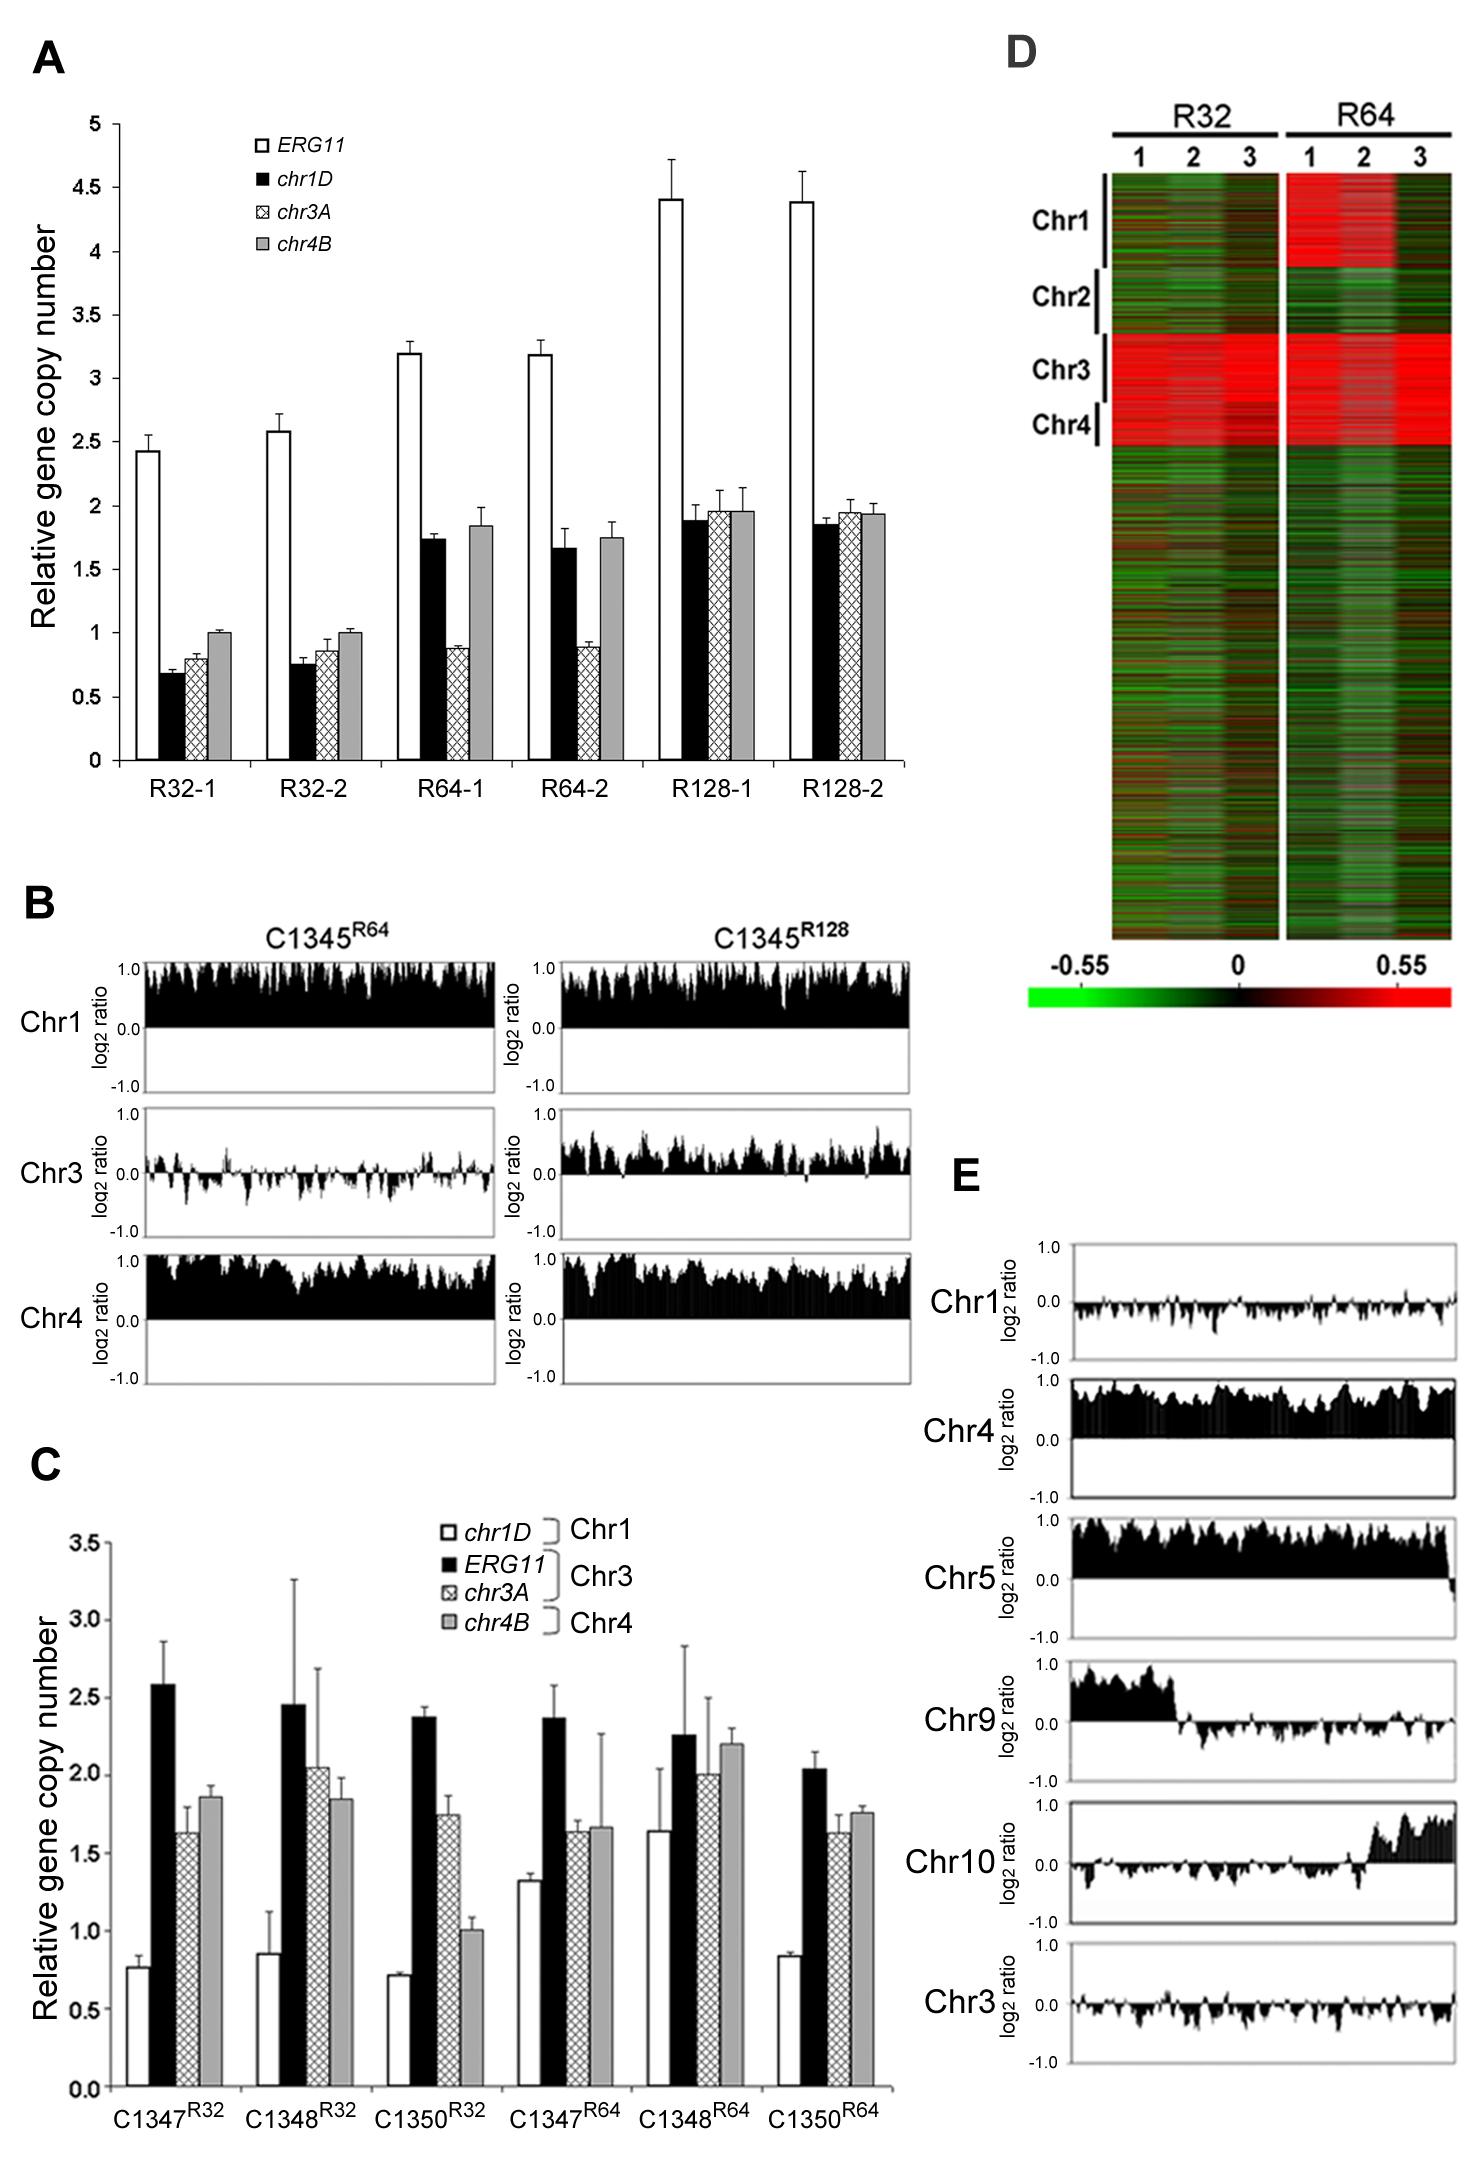 The importance of <i>ERG11</i> and <i>AFR1</i> in Chr1 duplication.